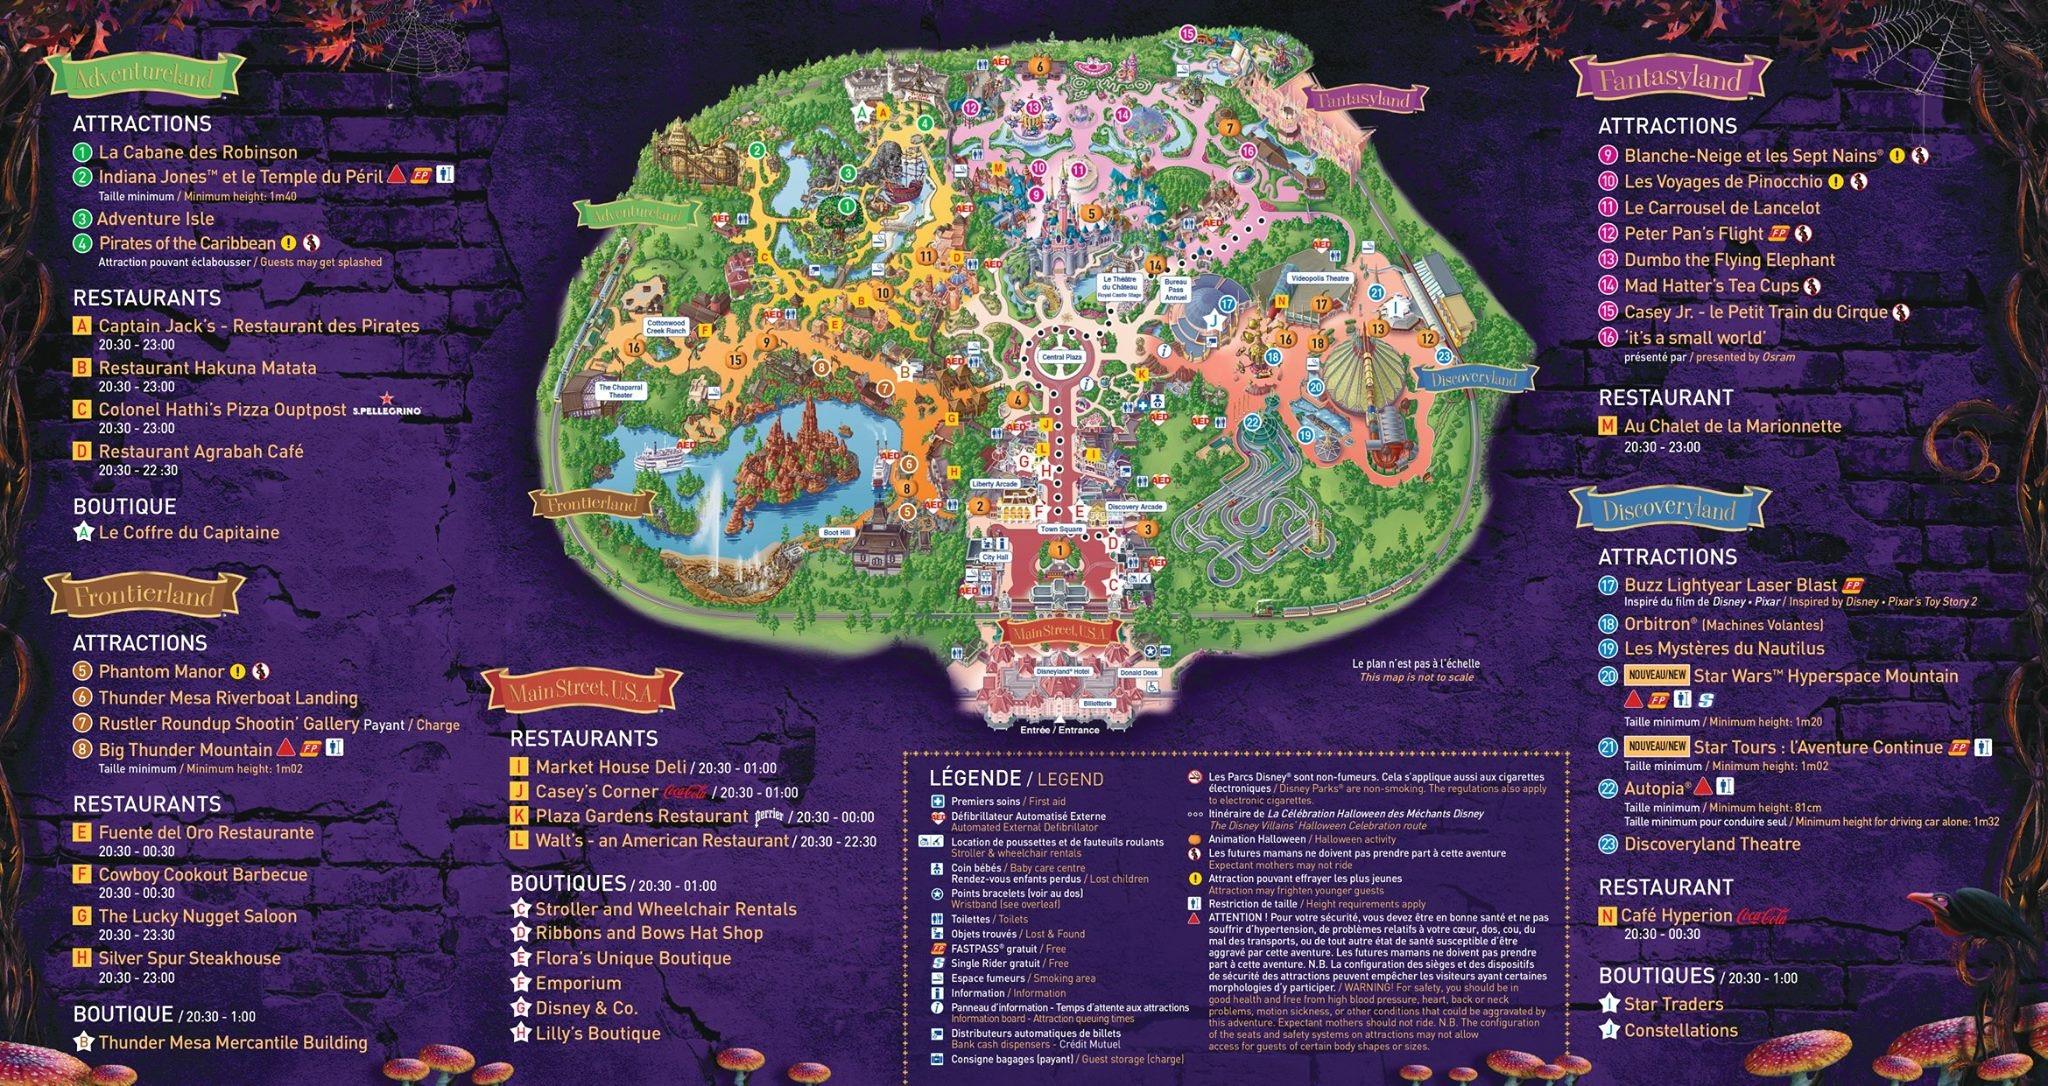 La Soirée Halloween Disney (31 octobre 2017)  - Page 6 37107408553_0a88d87637_o_d